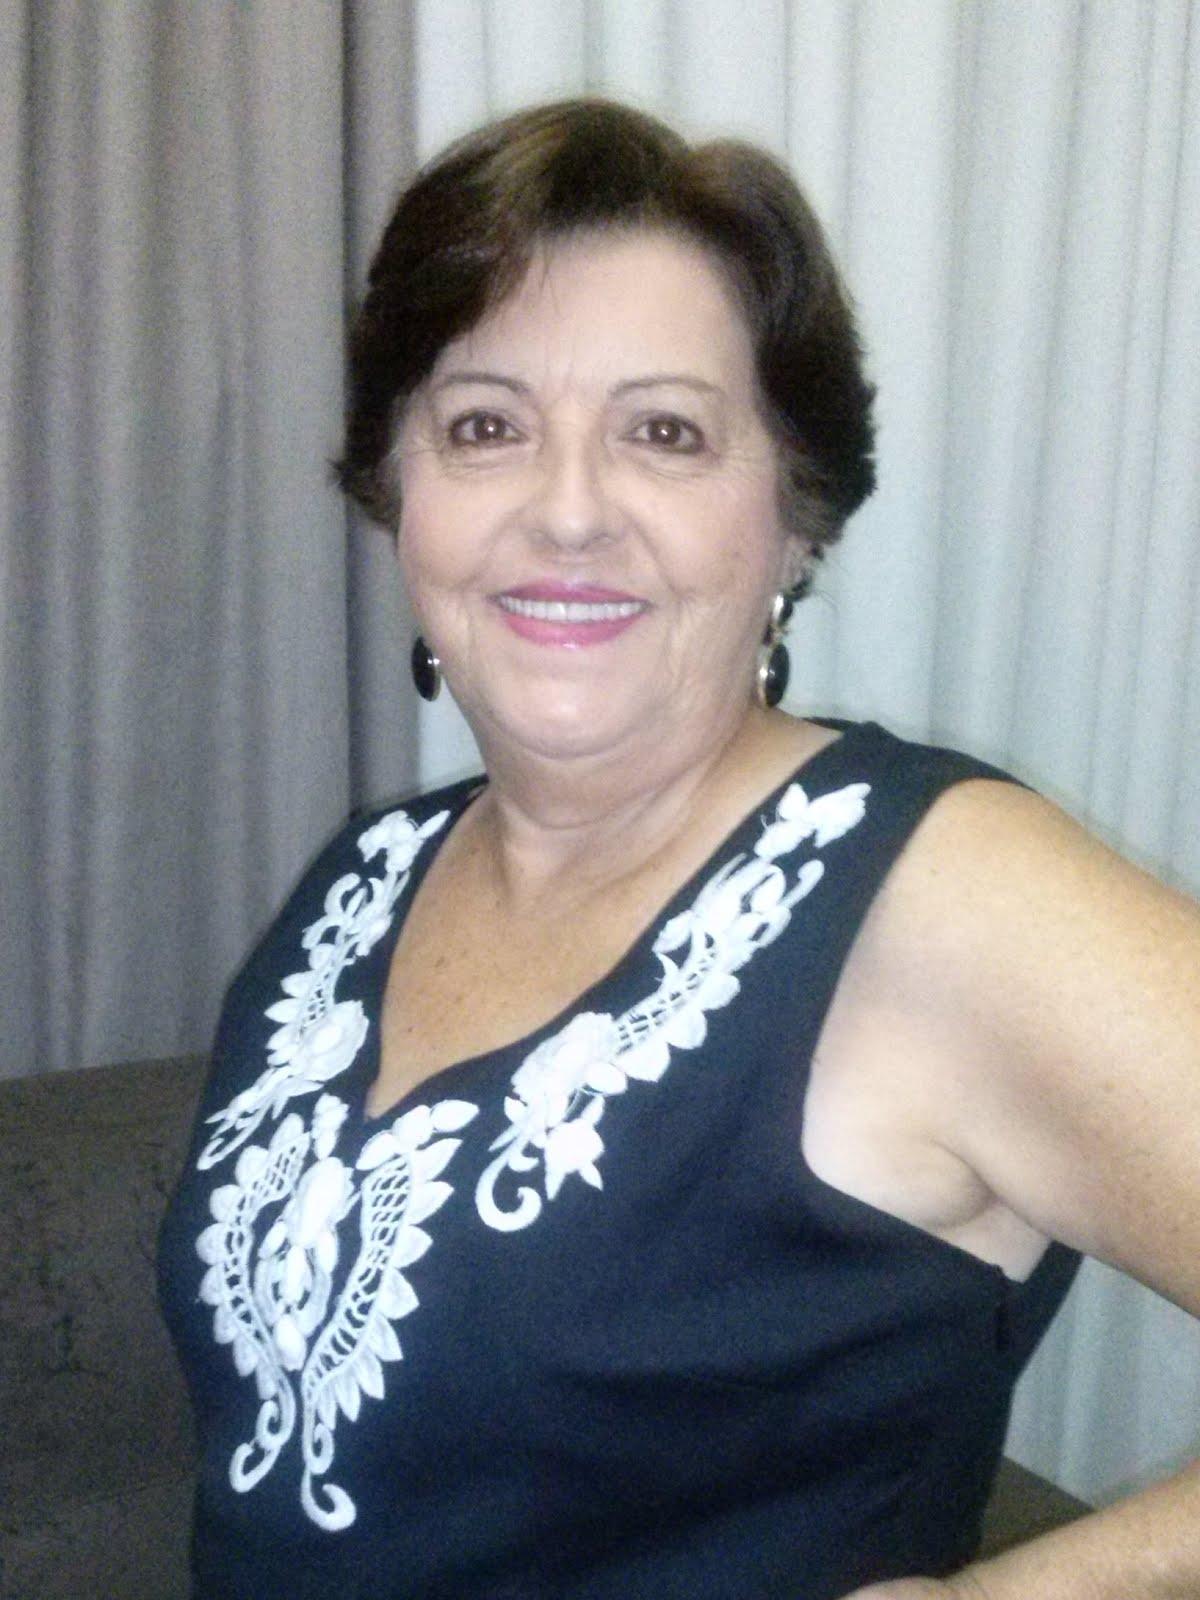 Tia Vera